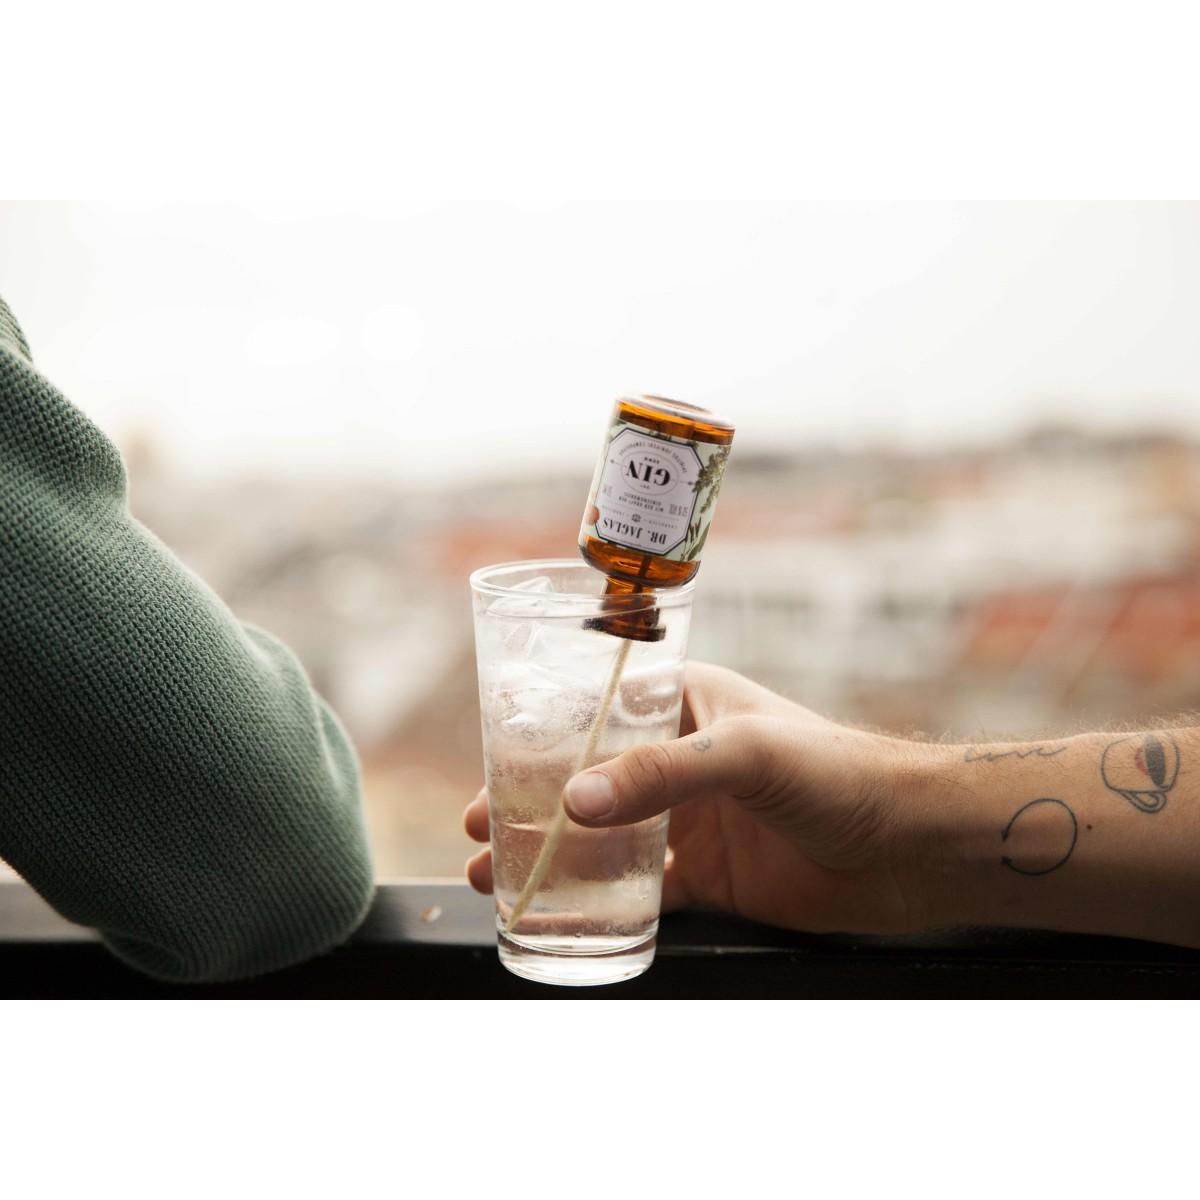 DR. JAGLAS Dry GIN-seng Navy Gin 6x50ml 50%vol